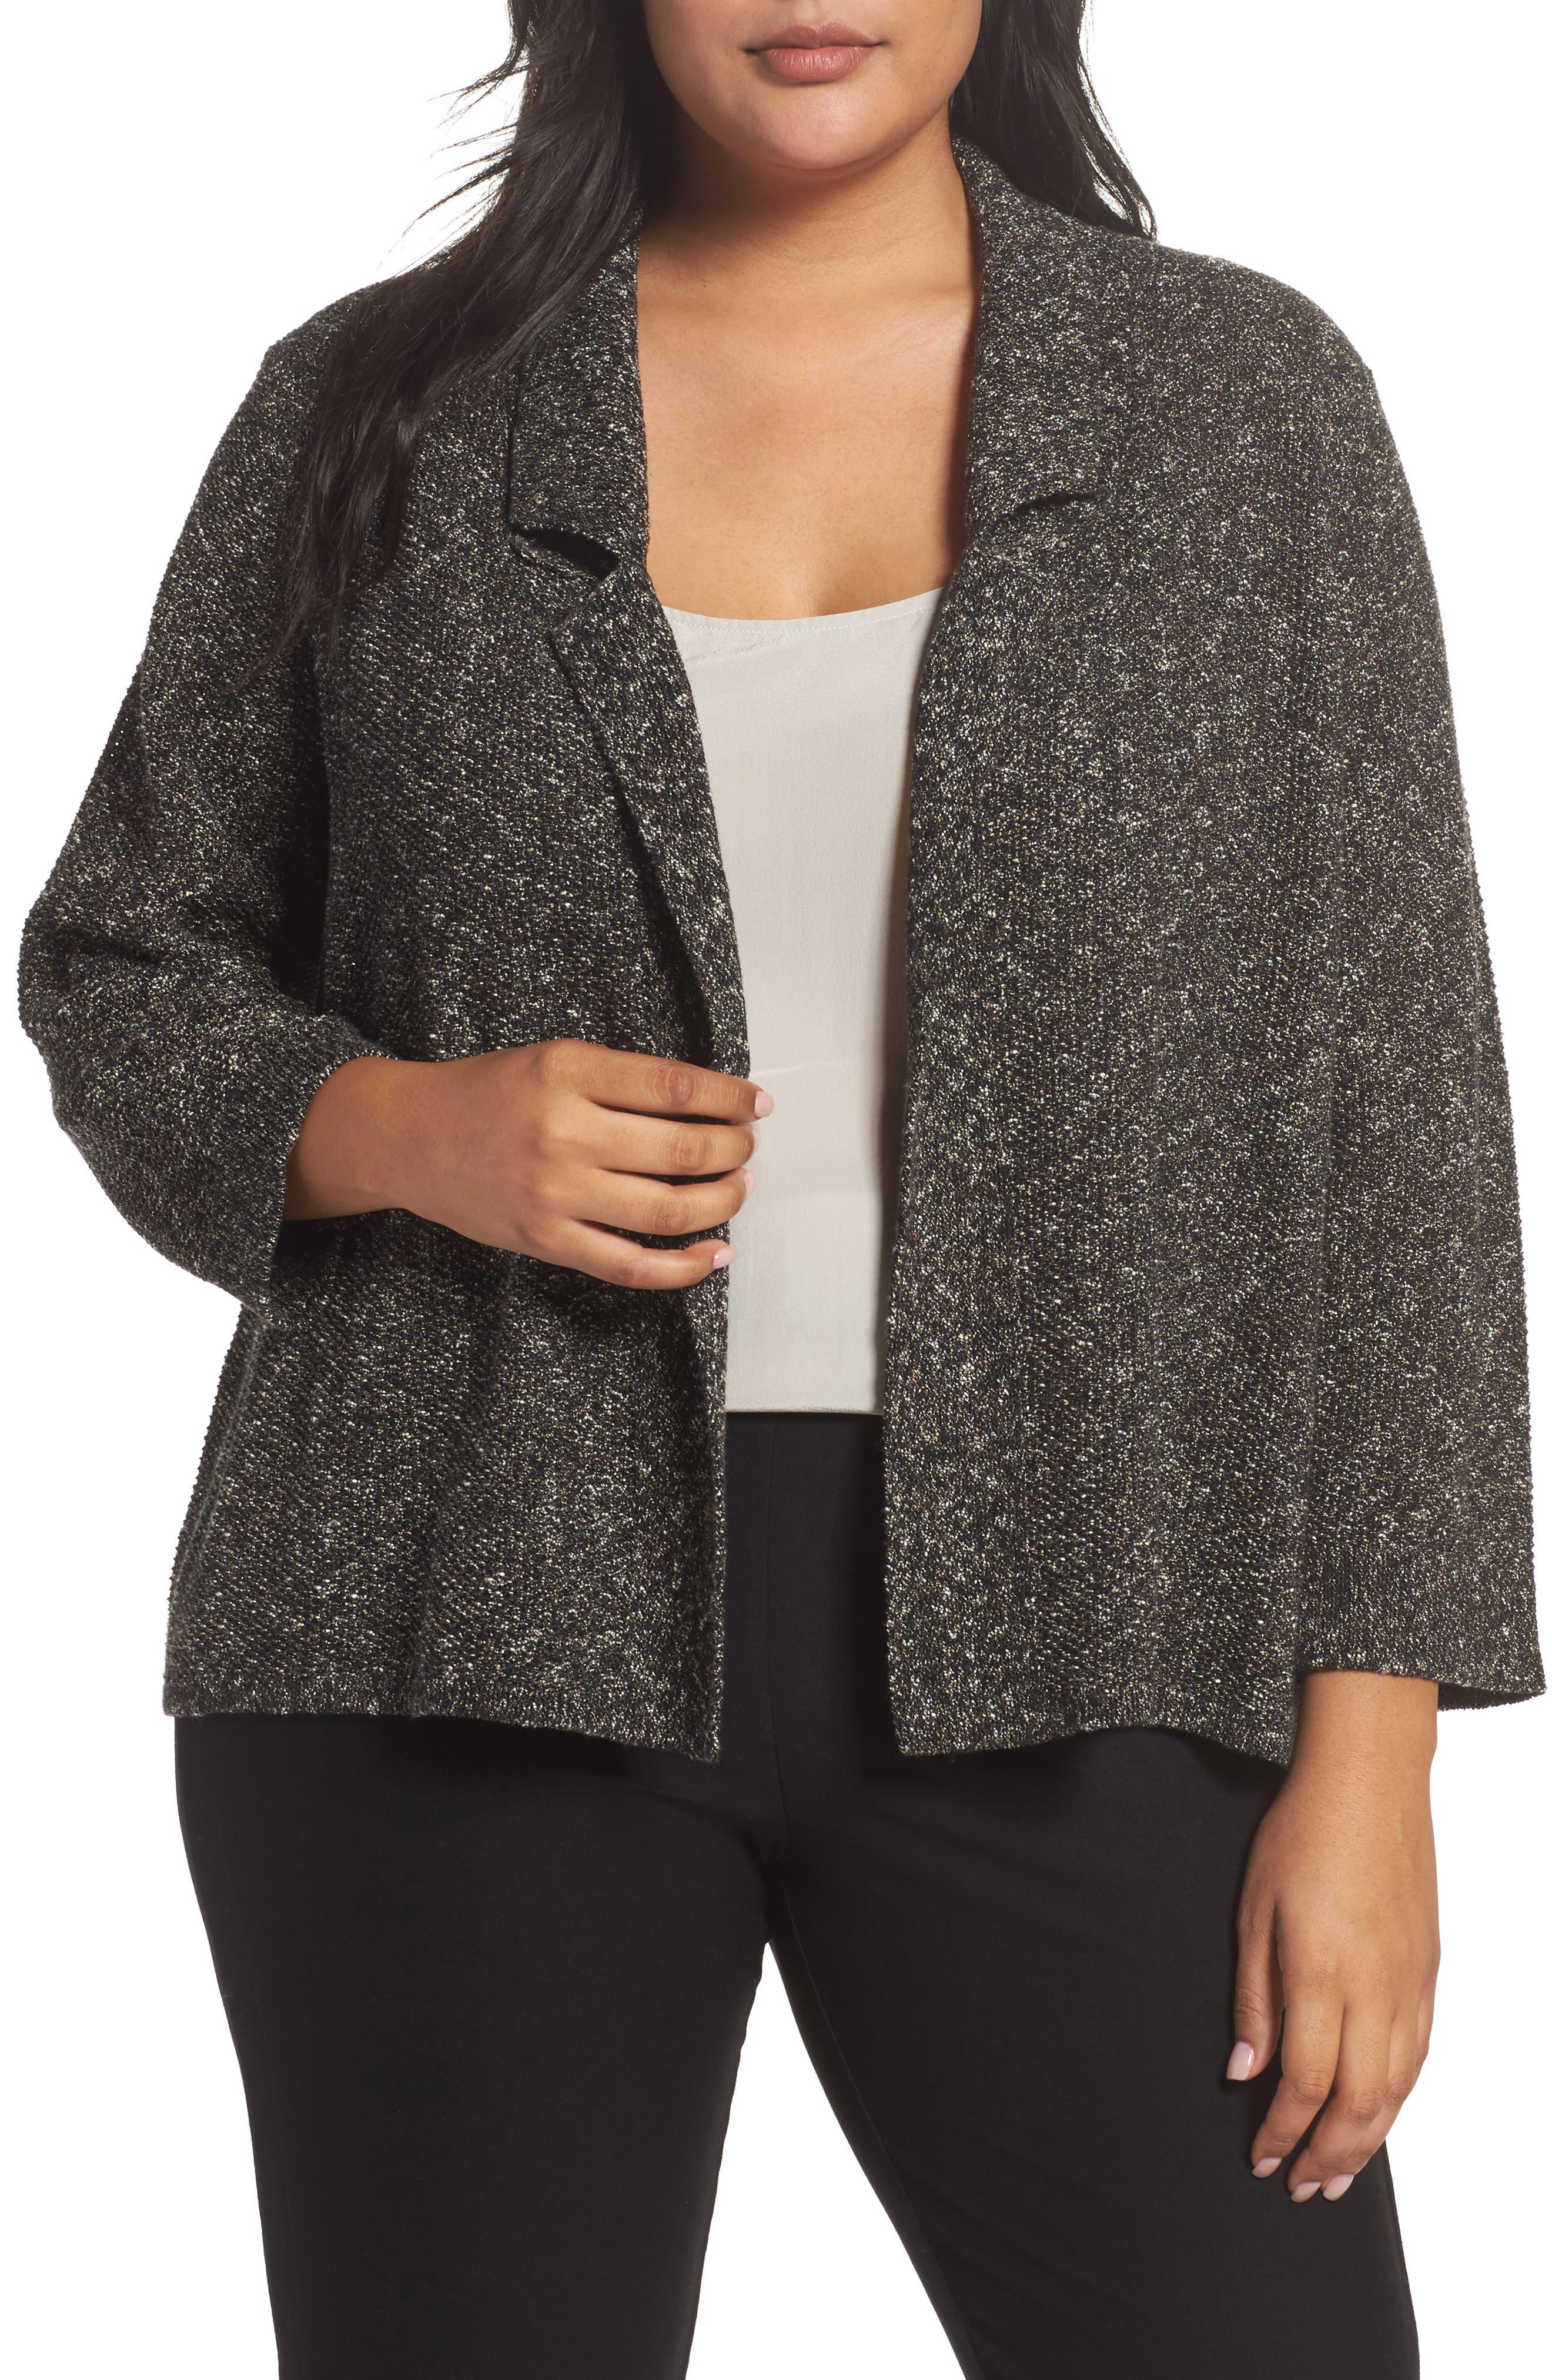 Main Image - Eileen Fisher Organic Cotton Blend Sweater Jacket (Plus Size)